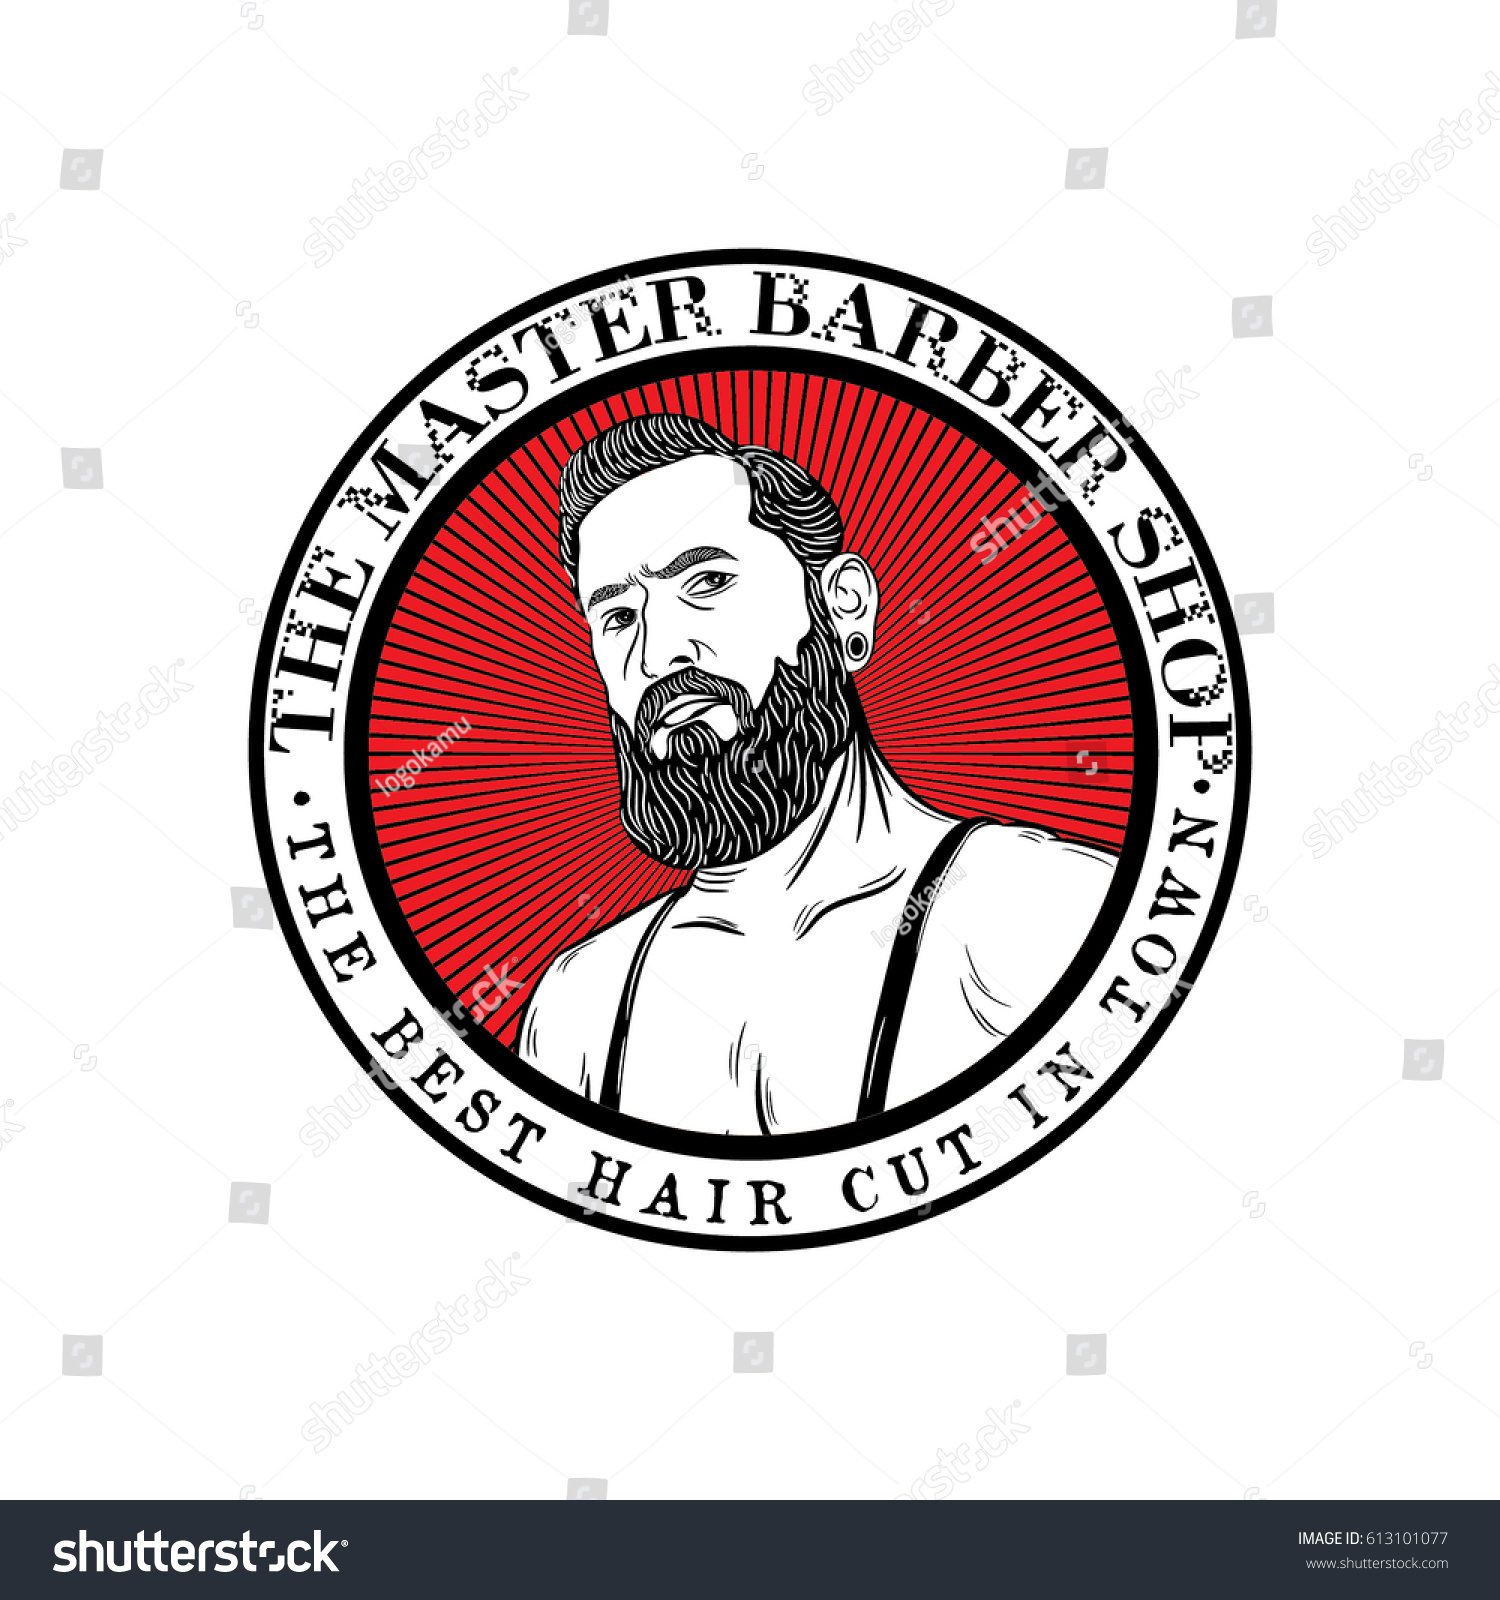 Clip art vector of vintage barber shop logo graphics and icon vector - Barber Shop Logo With Man Icon Vector Isolated